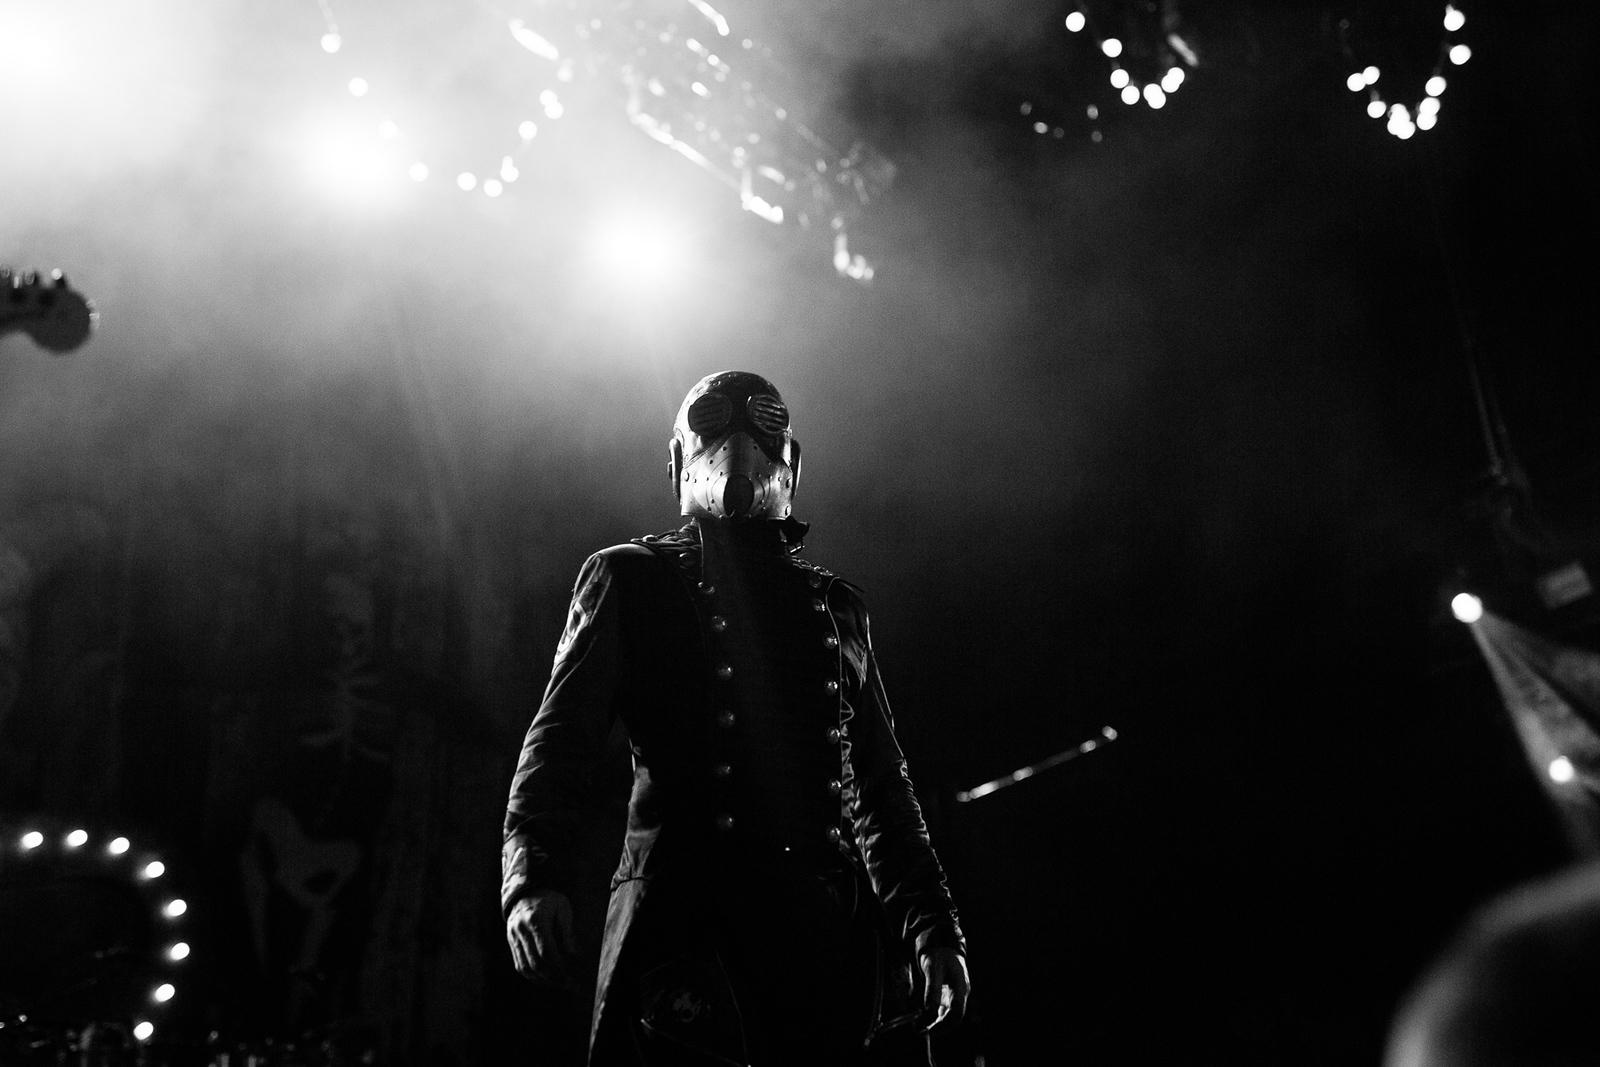 Sid Wilson of Slipknot by Adam Elmakias